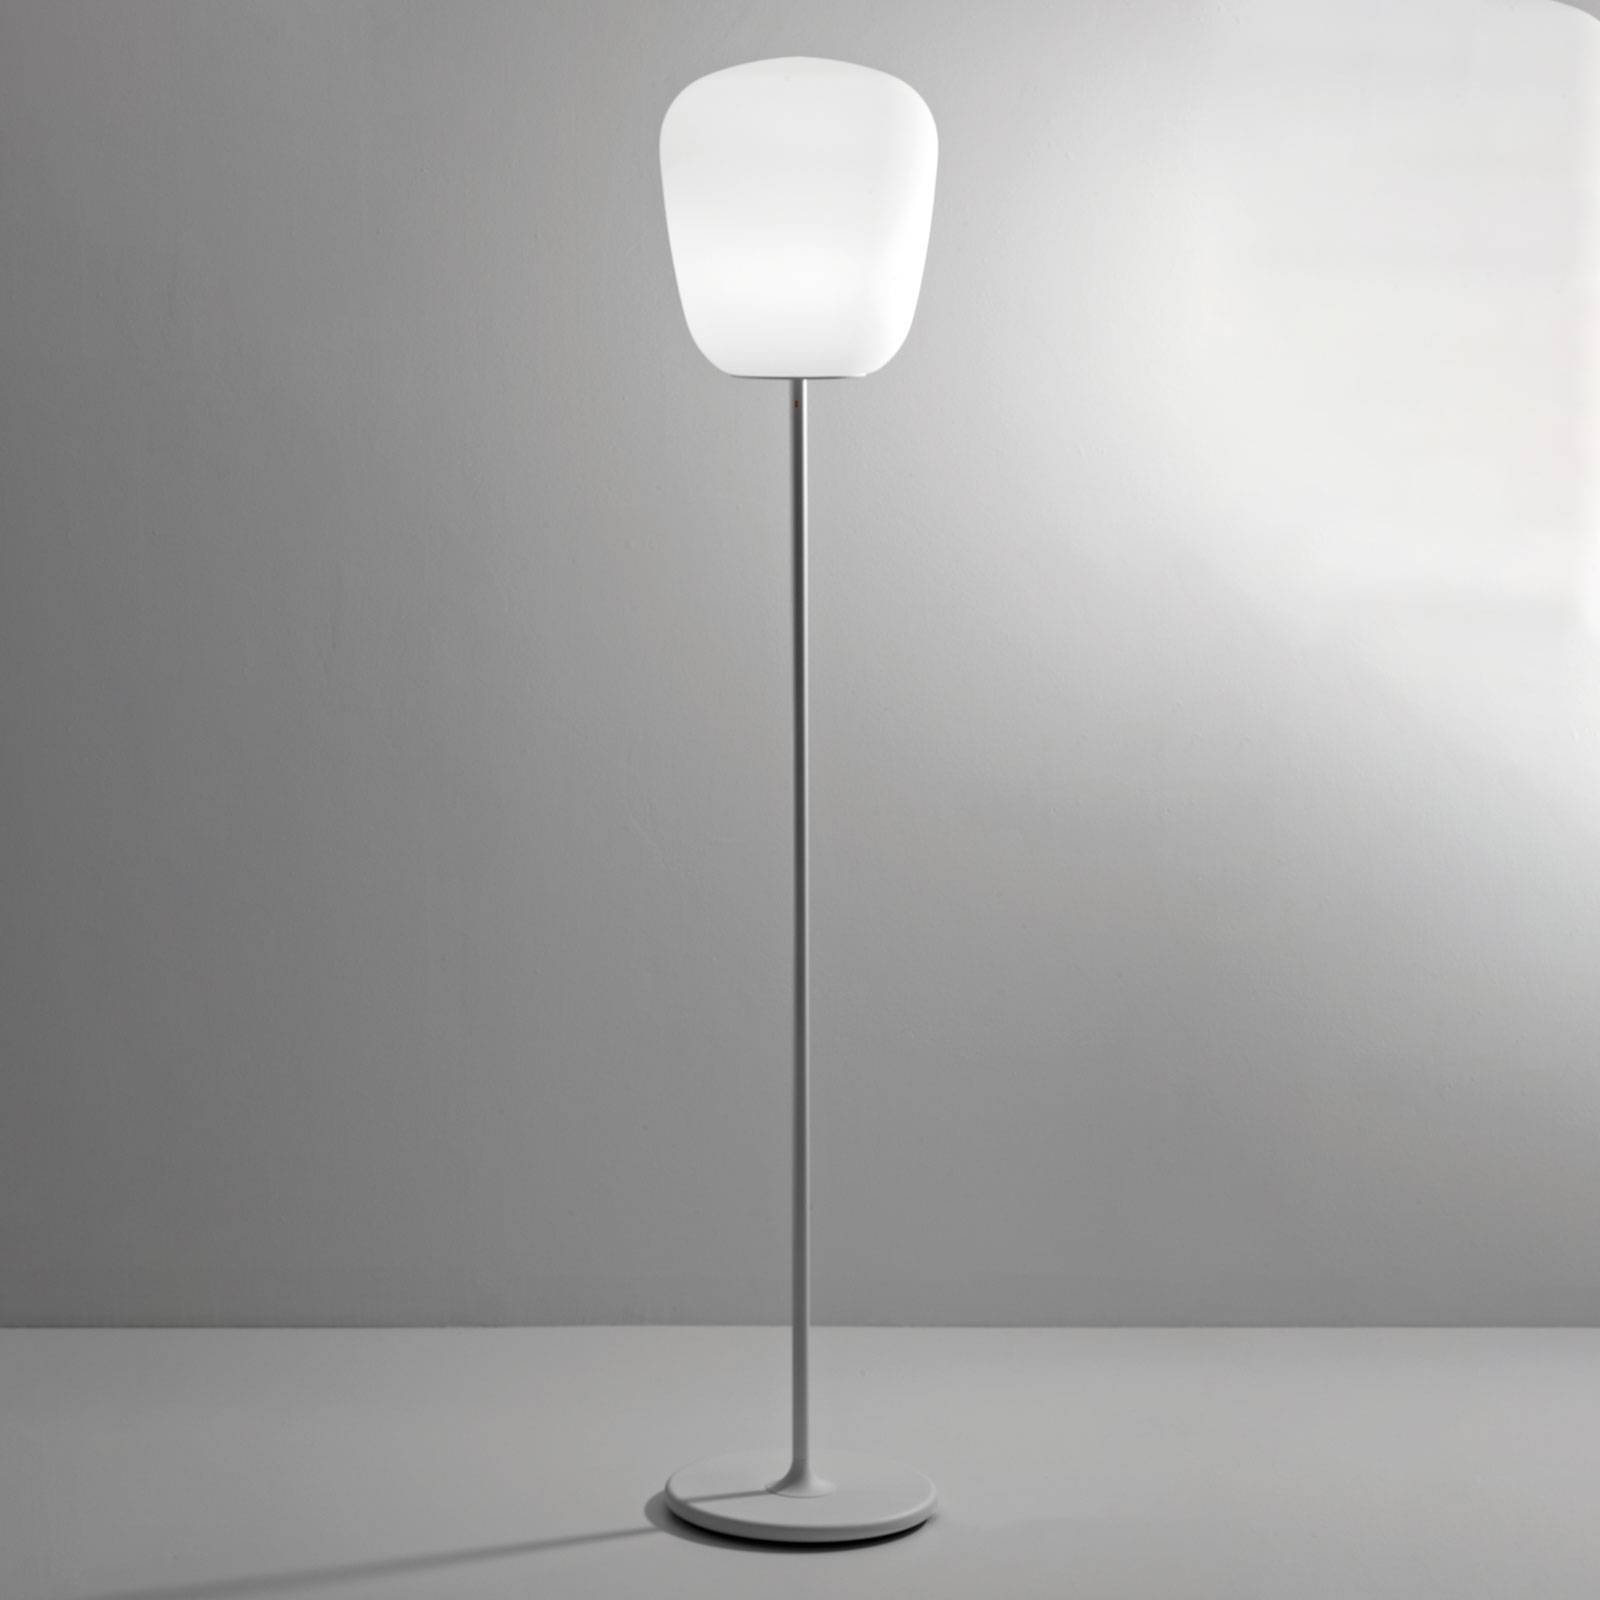 Fabbian Lumi Baka gulvlampe av glass, Ø 33 cm